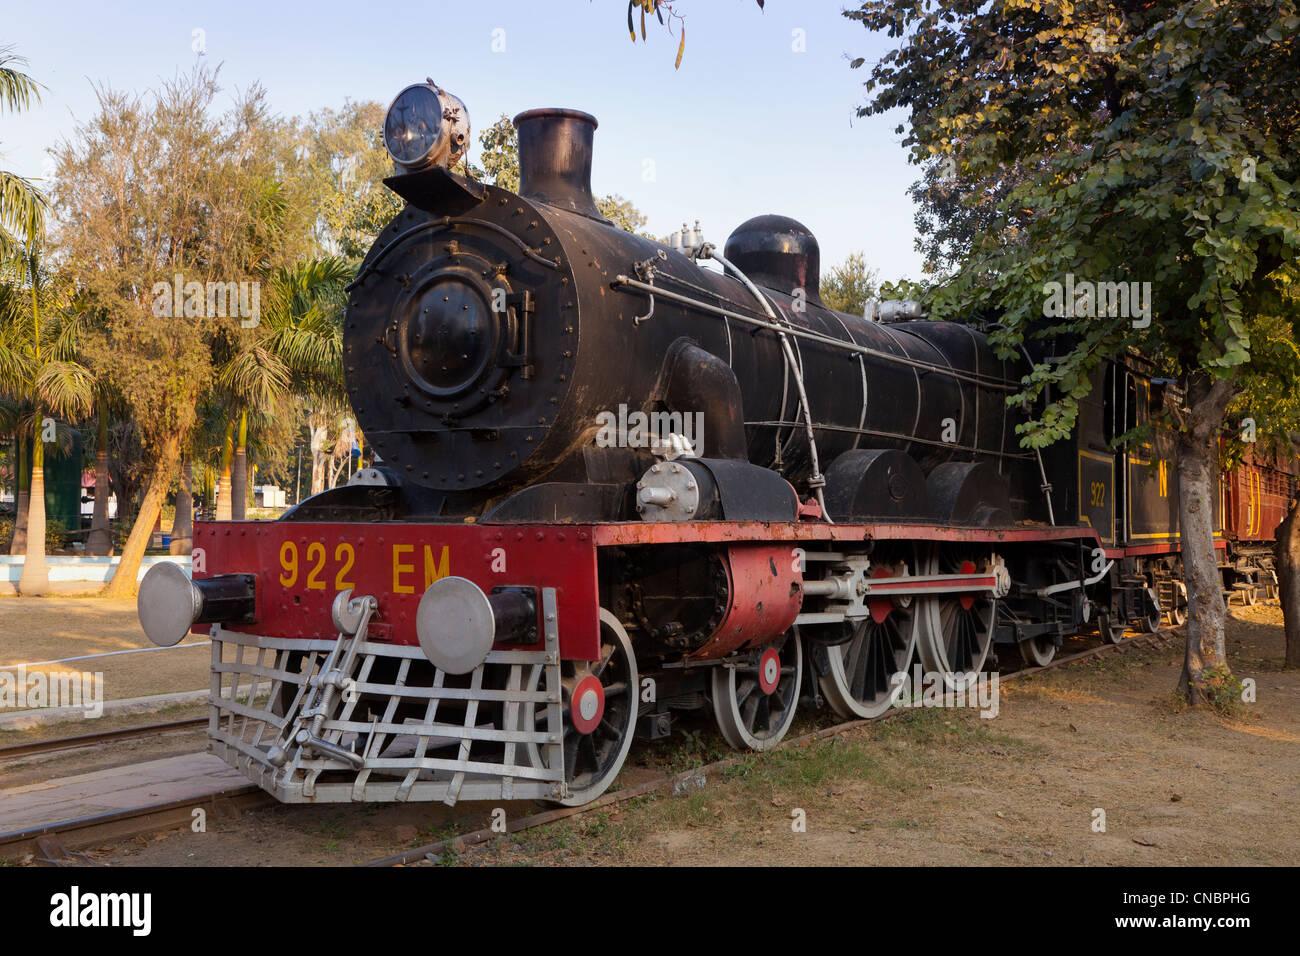 India, Uttar Pradesh, New Delhi, Railway Museum, Steam Locomotive - Stock Image